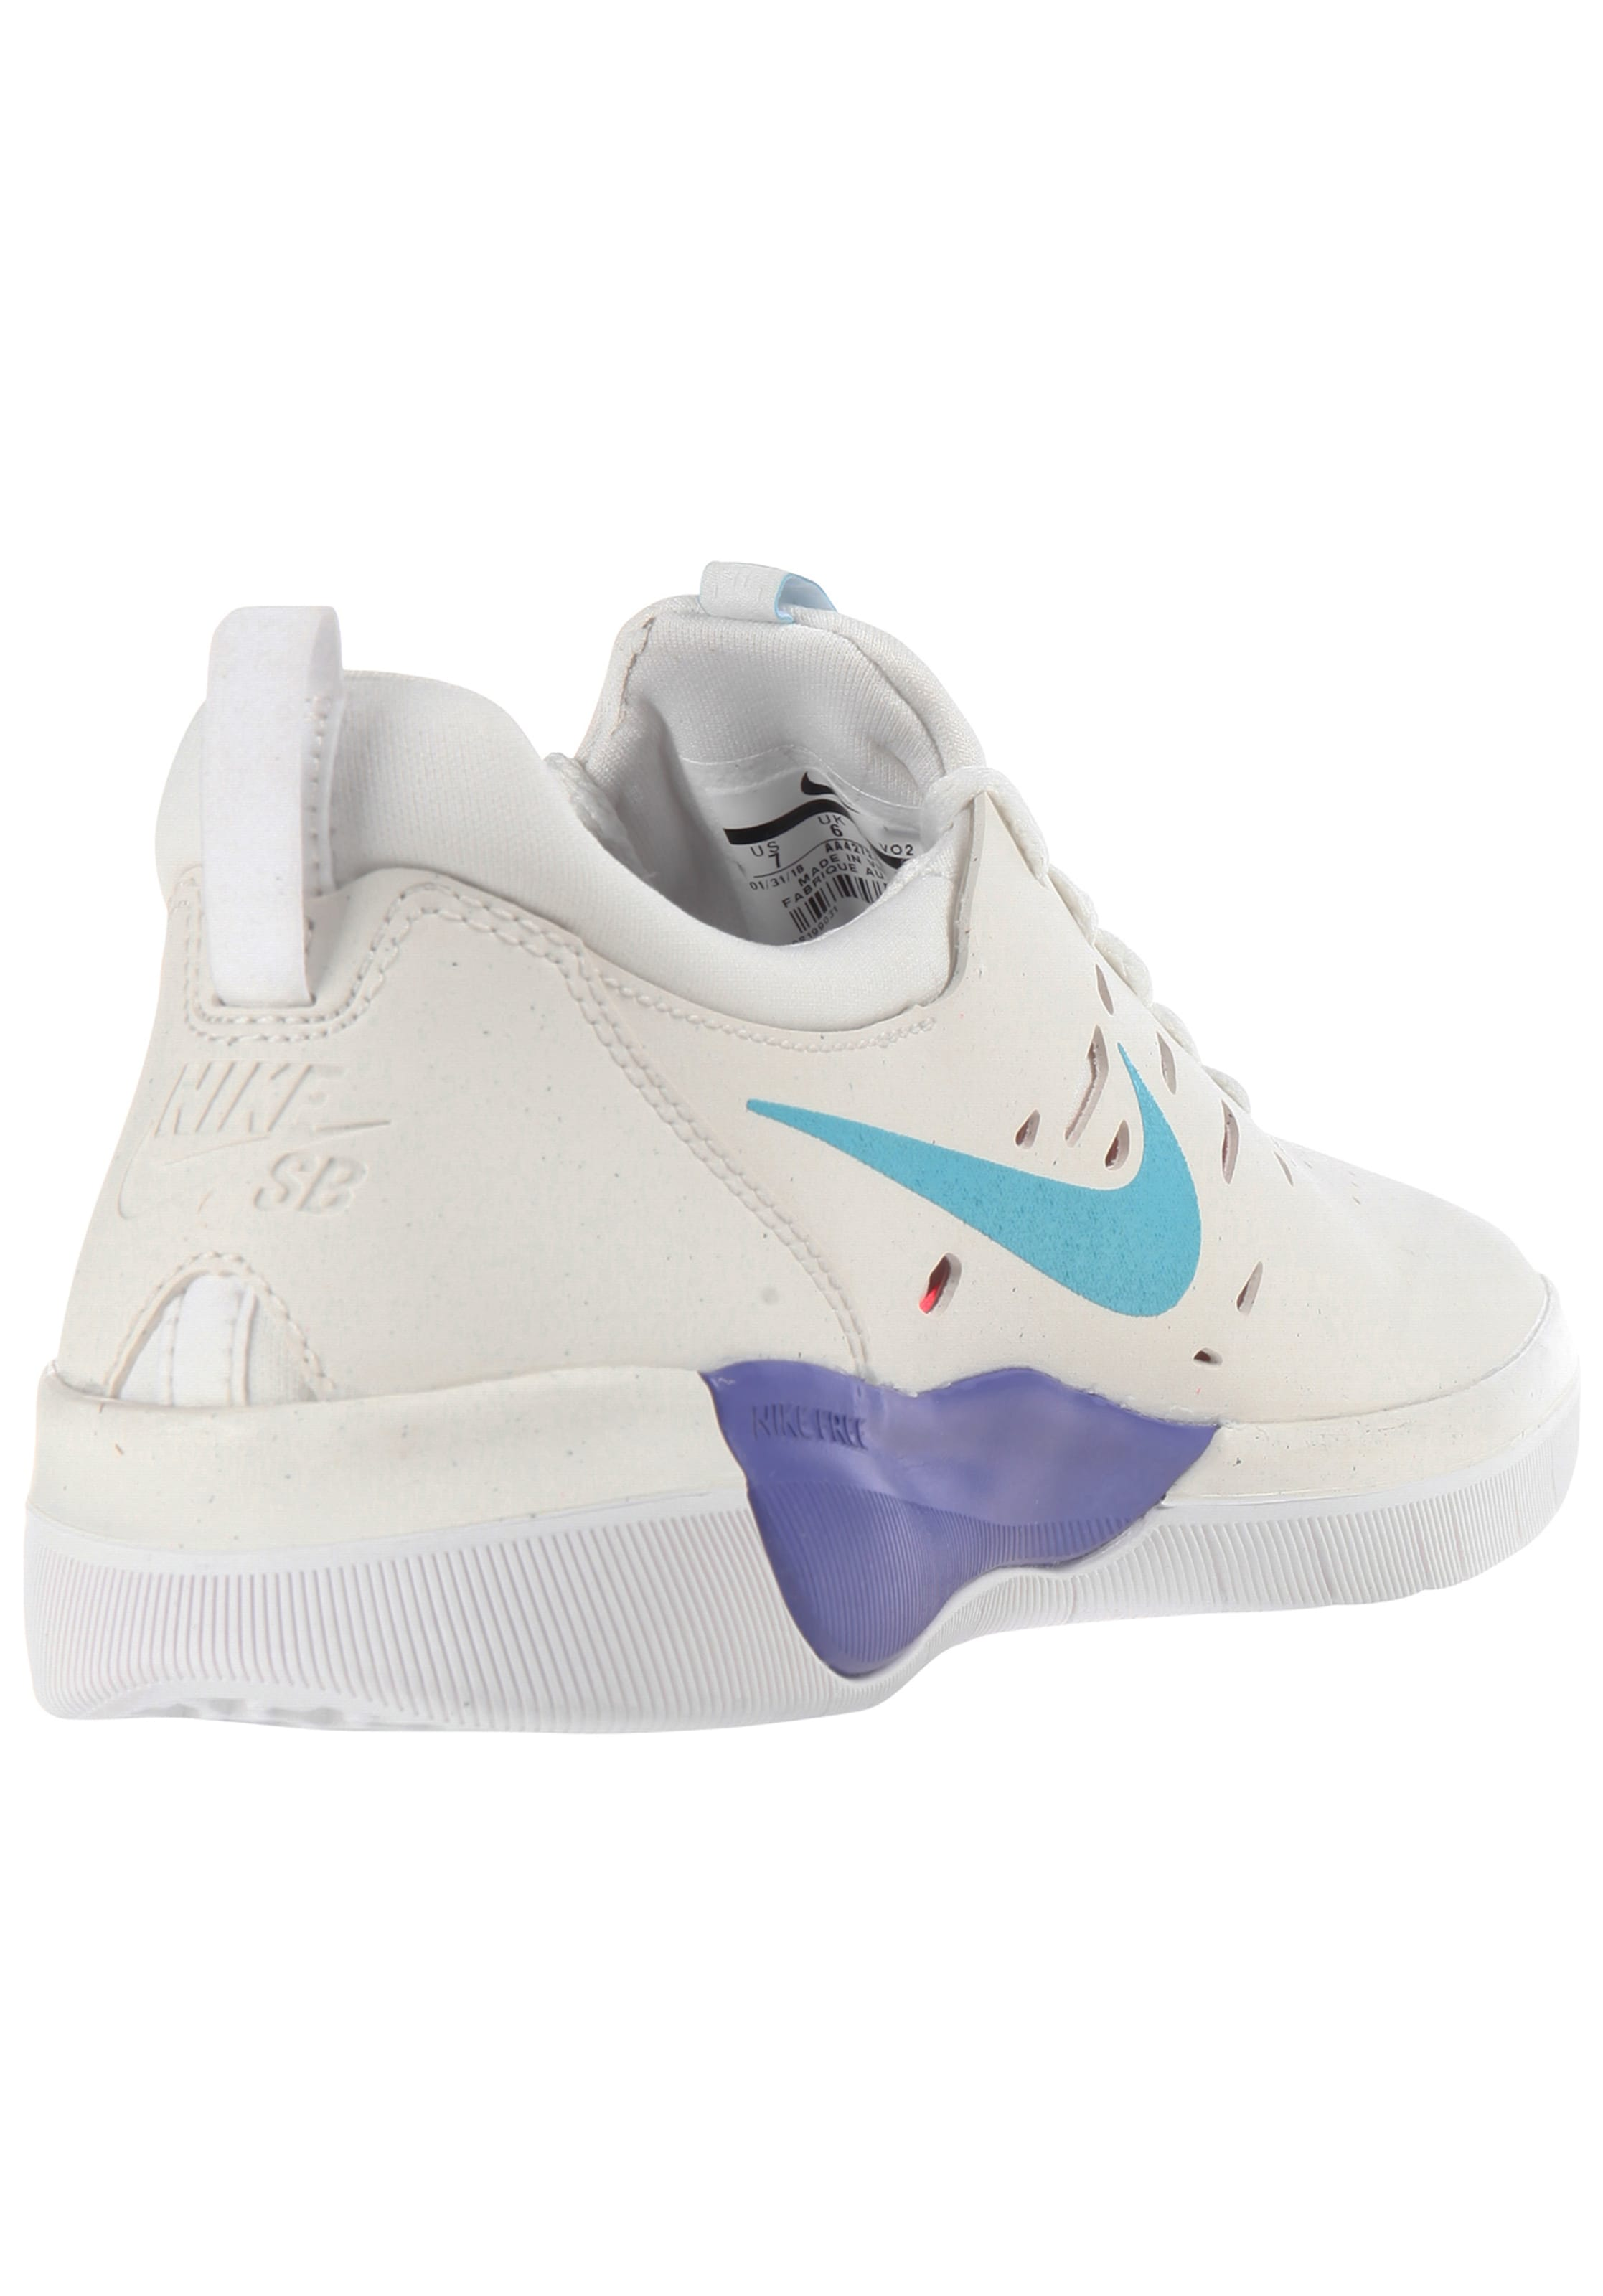 Nike SB Nyjah Nyjah Nyjah Free Turnschuhe Kunststoff Bequem, gut aussehend 25f8d5